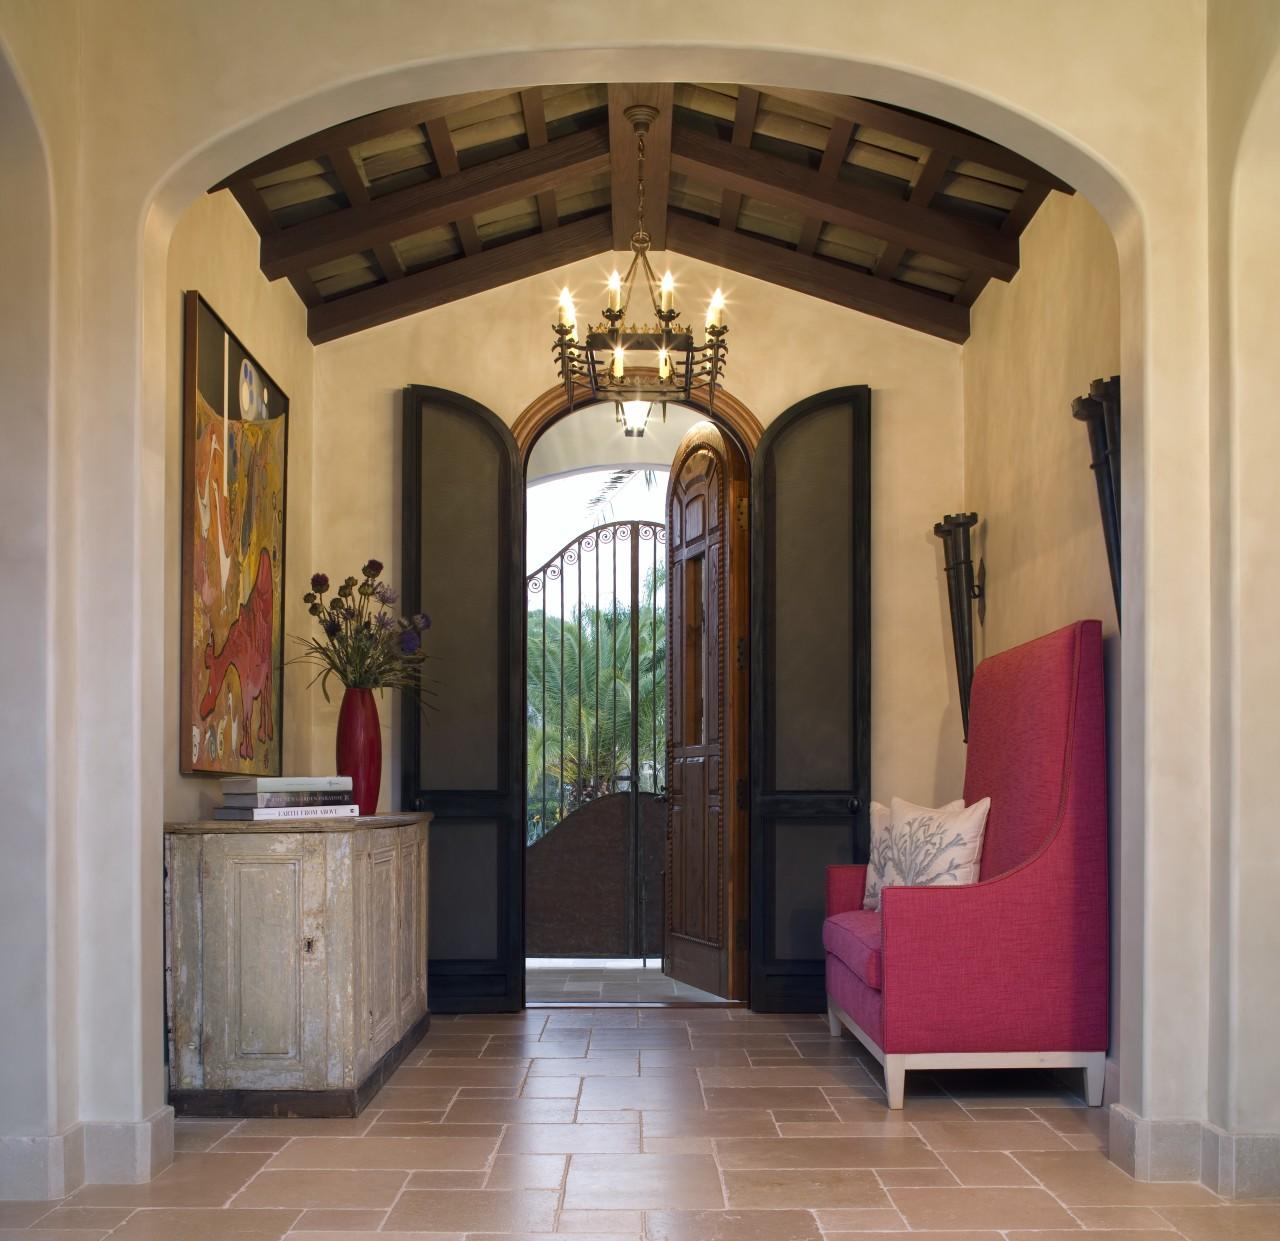 Spanish style interior arch, ceiling, door, estate, home, interior design, lobby, property, real estate, brown, orange